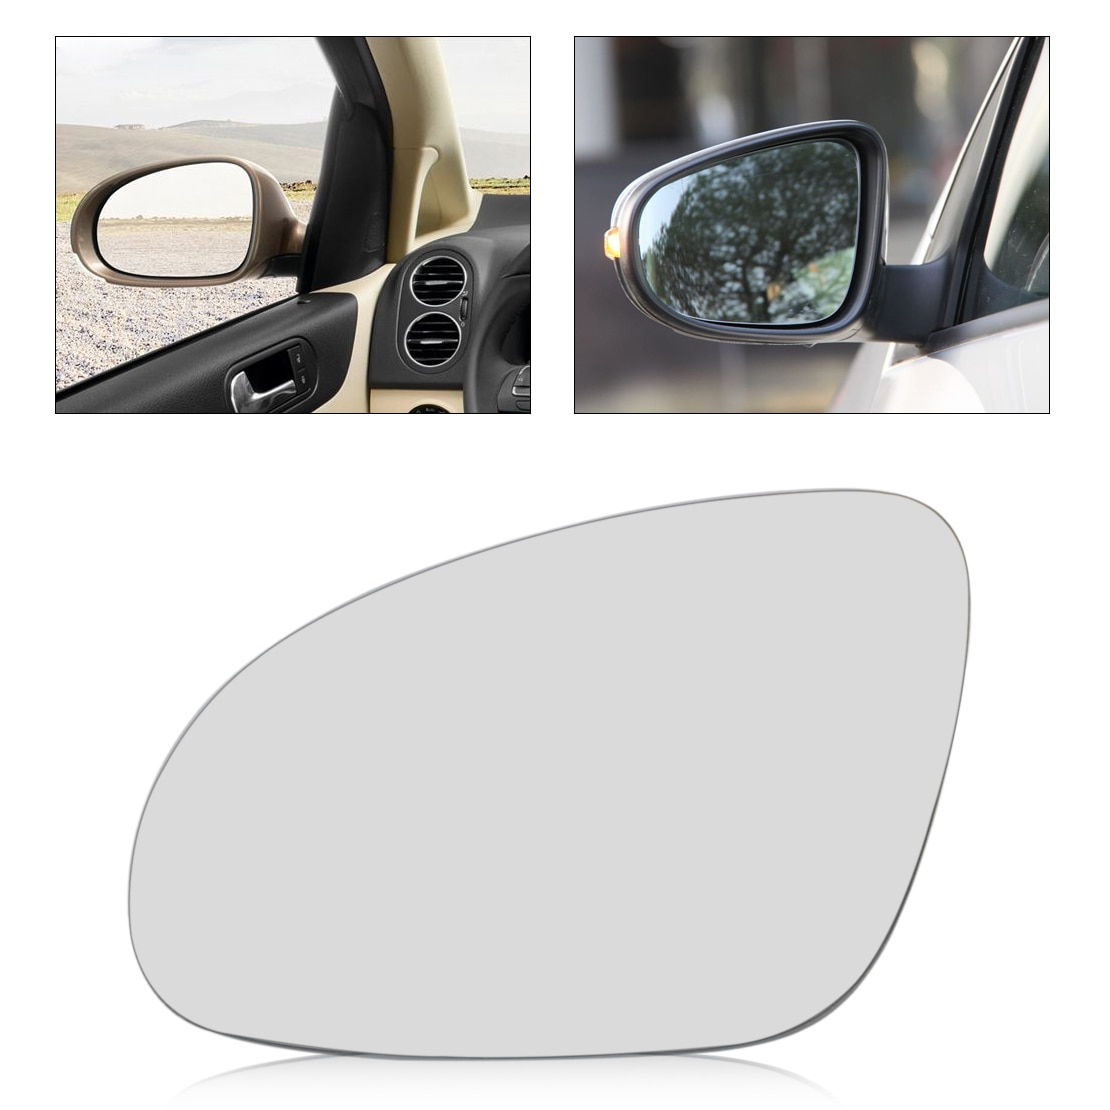 Espejo retrovisor lateral izquierdo para coche beler, cristal térmico con soporte para Volkswagen, Volkswagen, Golf, GTI, Jetta, MK5, EOS Rabbit R32, Passat B6